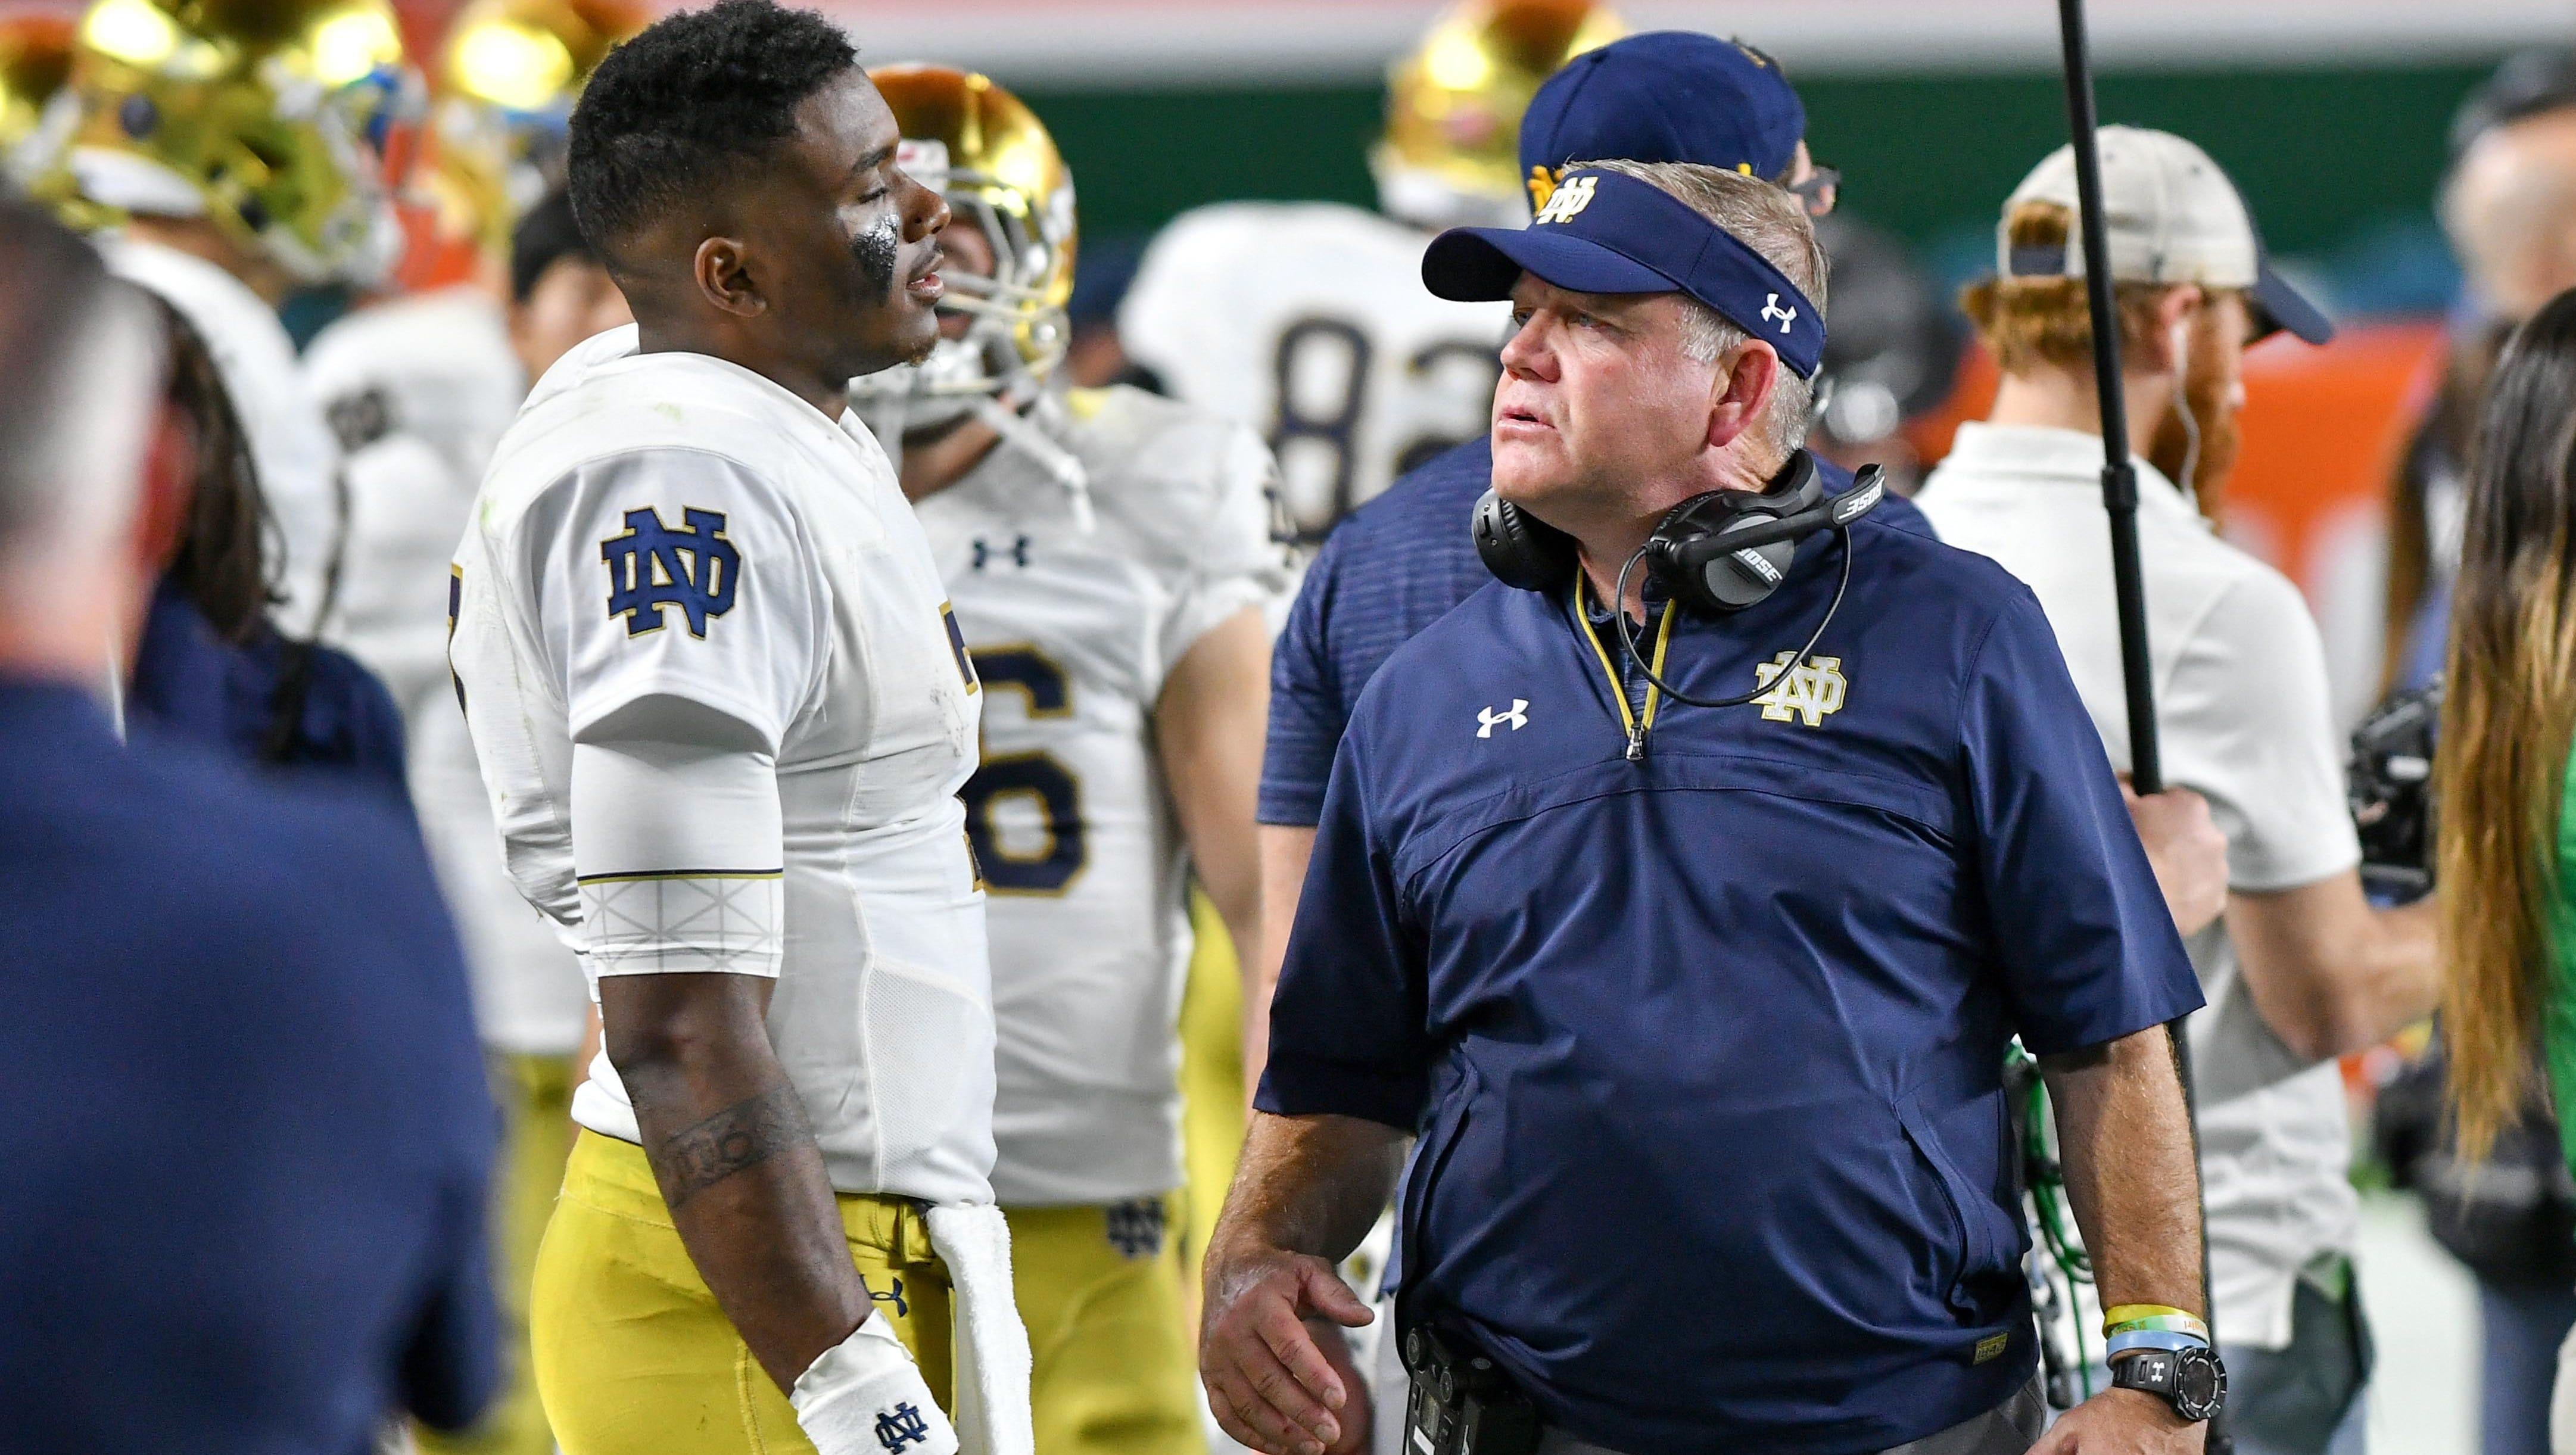 Notre Dame football: After Miami loss, Brandon Wimbush on to Navy